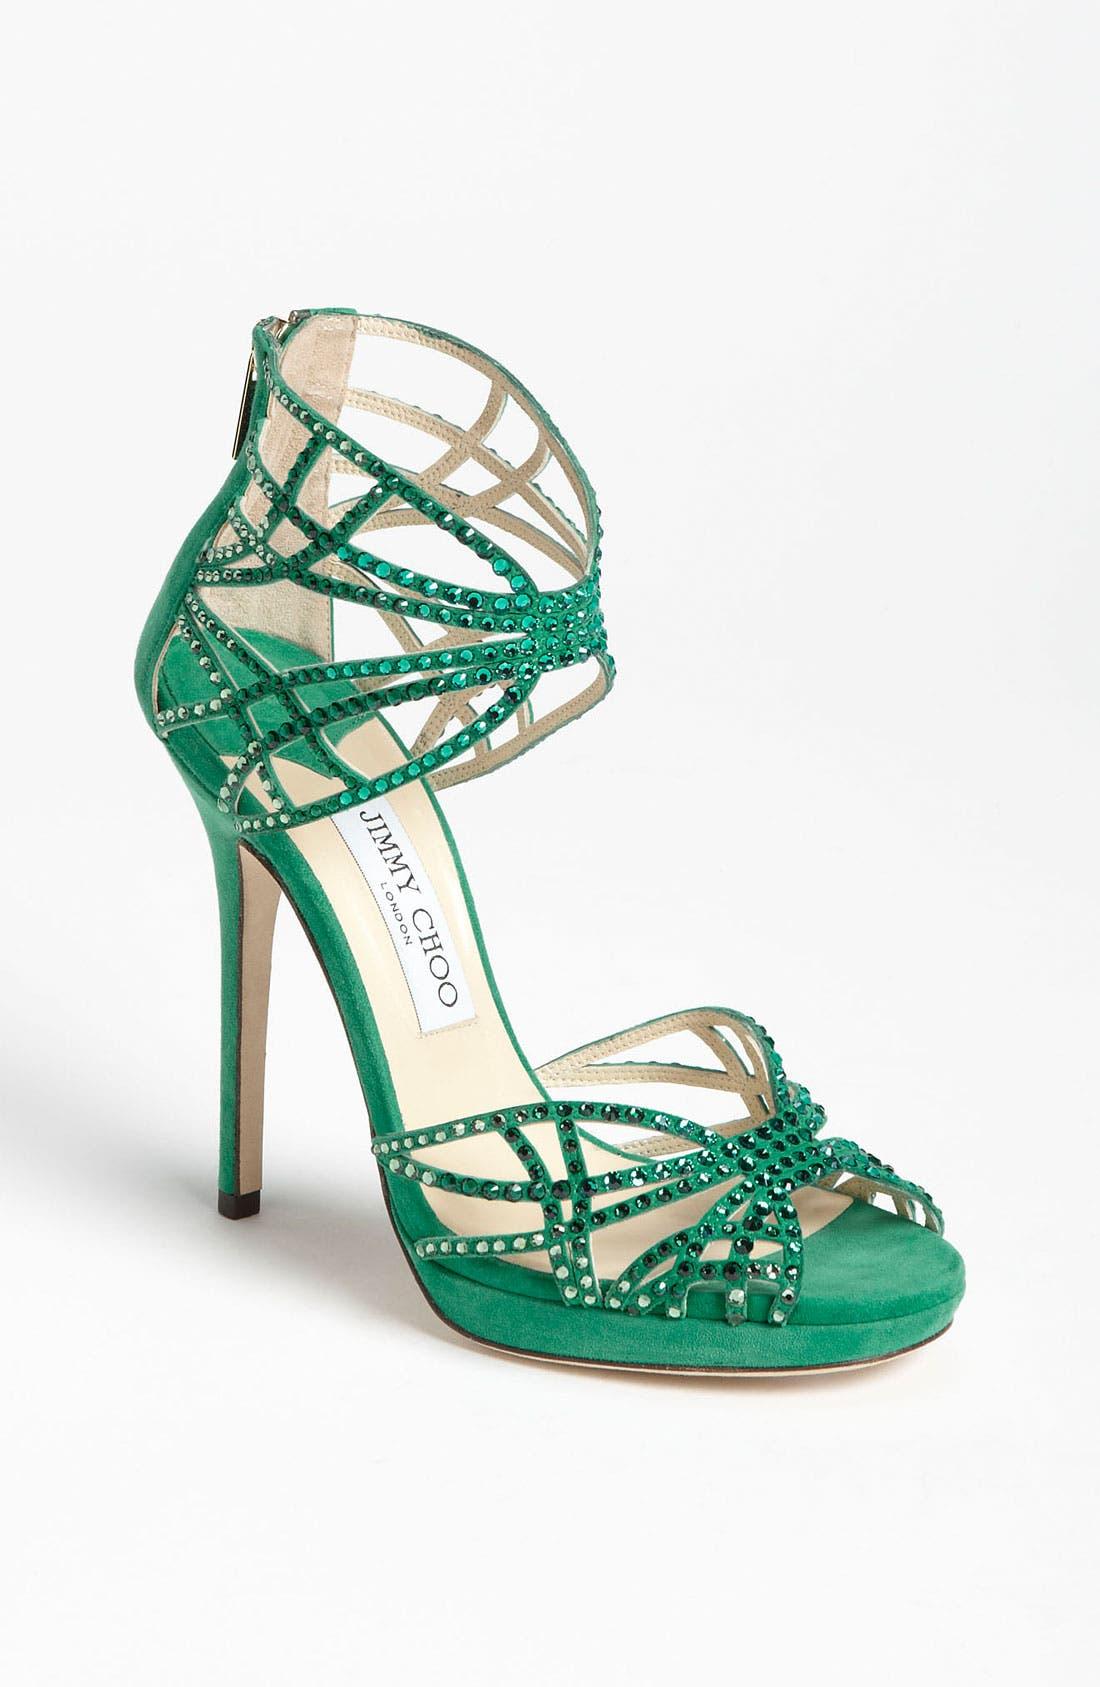 Main Image - Jimmy Choo 'Diva' Sandal